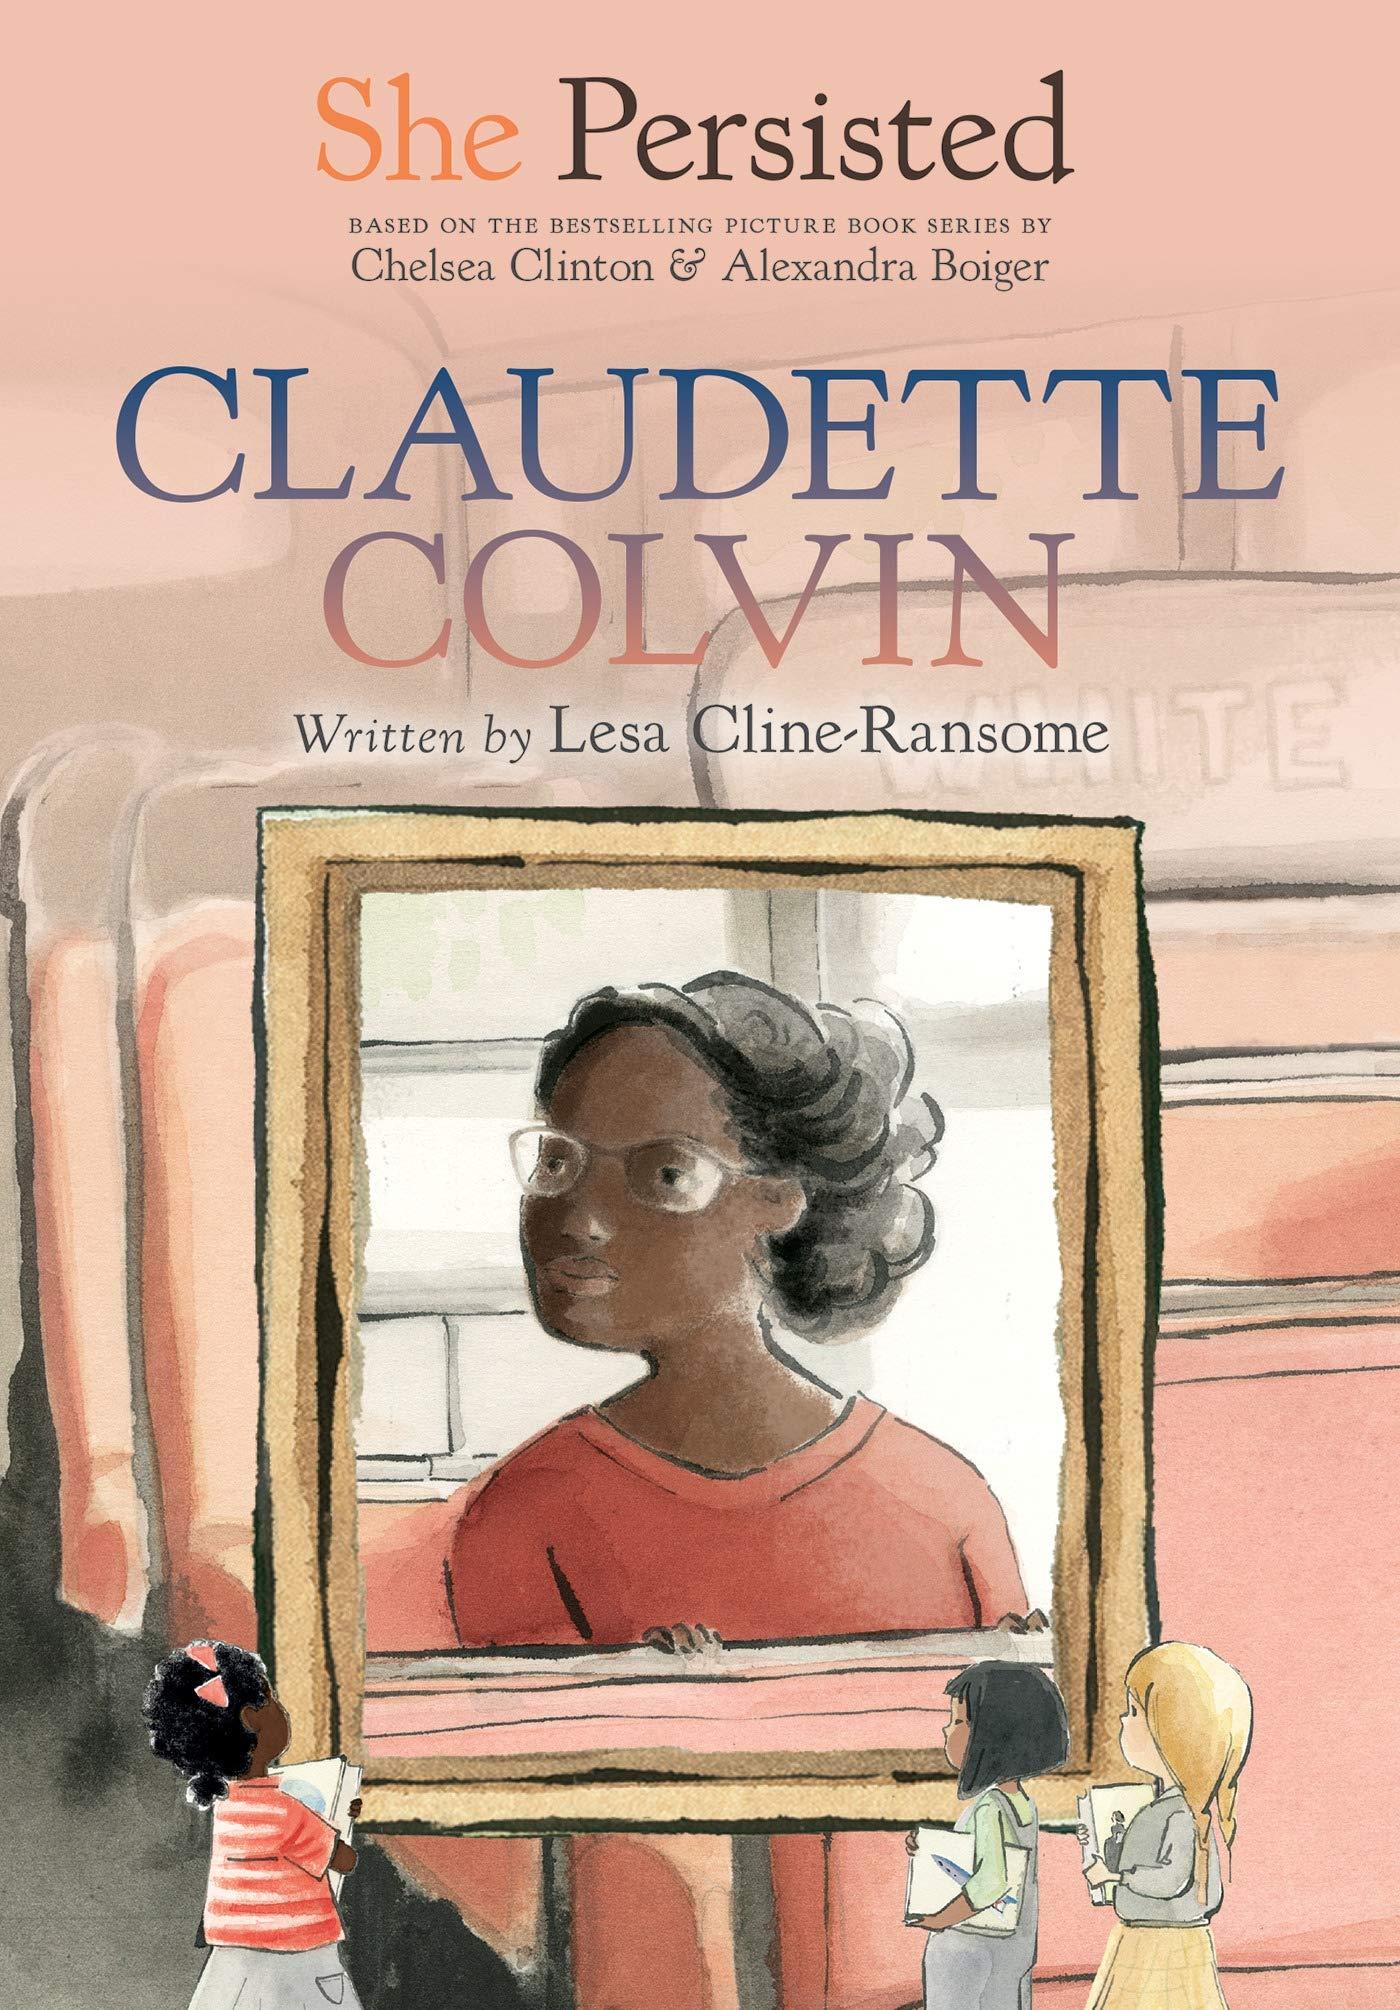 She Persisted: Claudette Colvin: Cline-Ransome, Lesa, Clinton, Chelsea,  Boiger, Alexandra, Flint, Gillian: 9780593115831: Amazon.com: Books